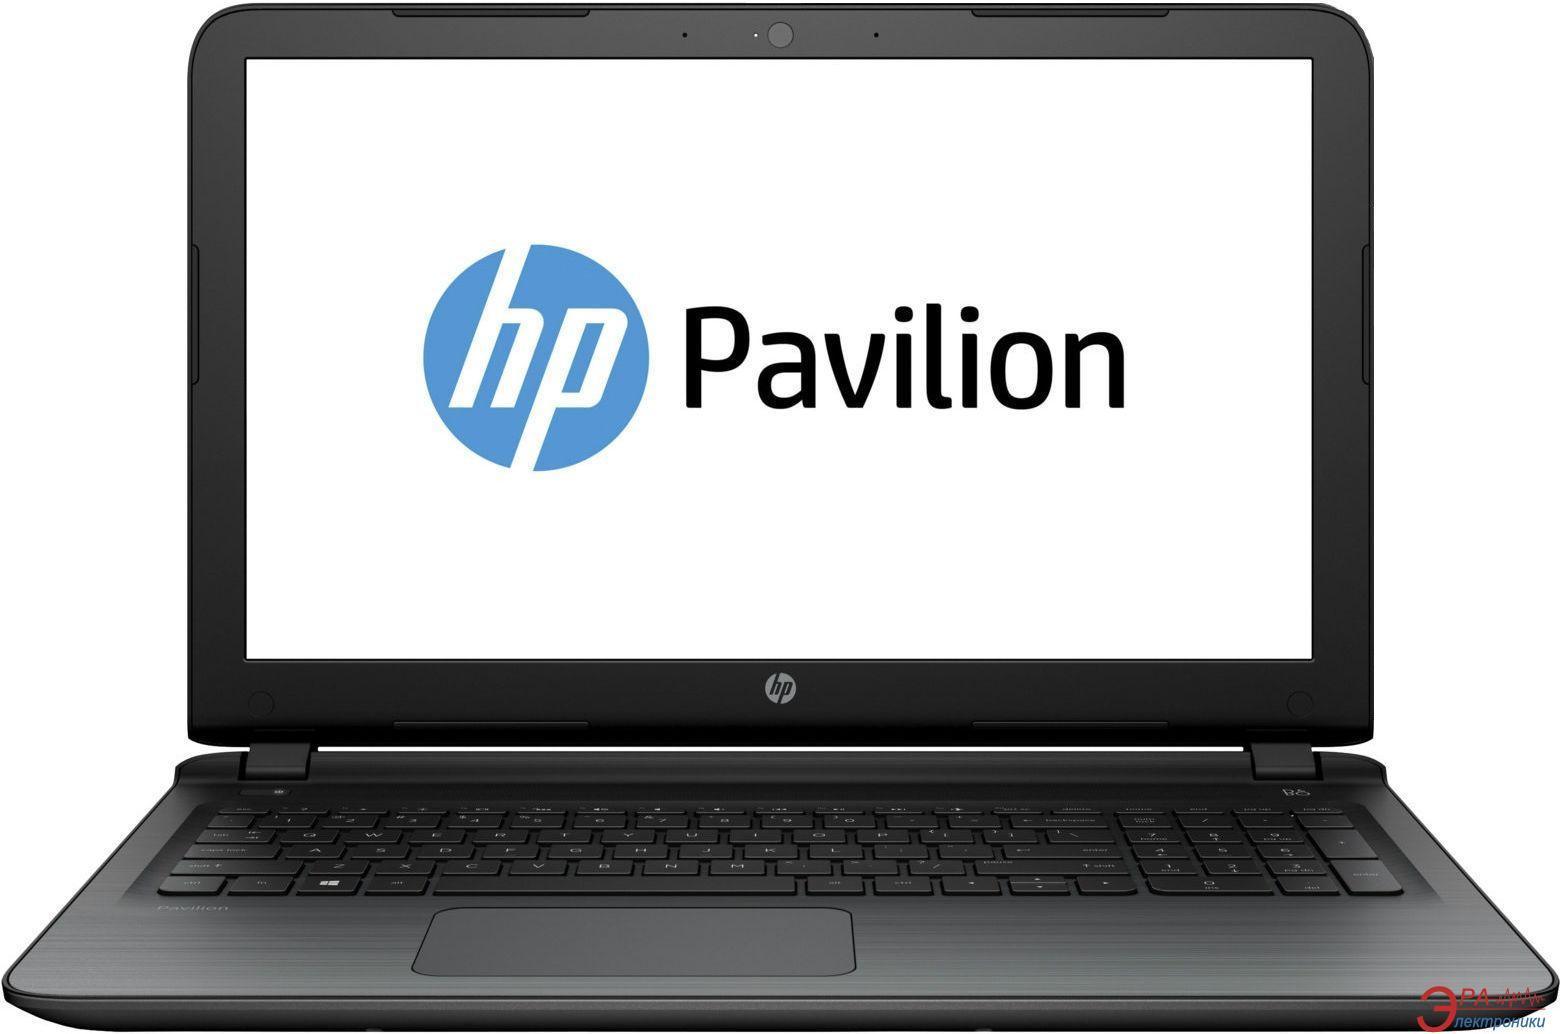 Ноутбук HP Pavilion 15-ab243ur (V0Z58EA) Black 15,6